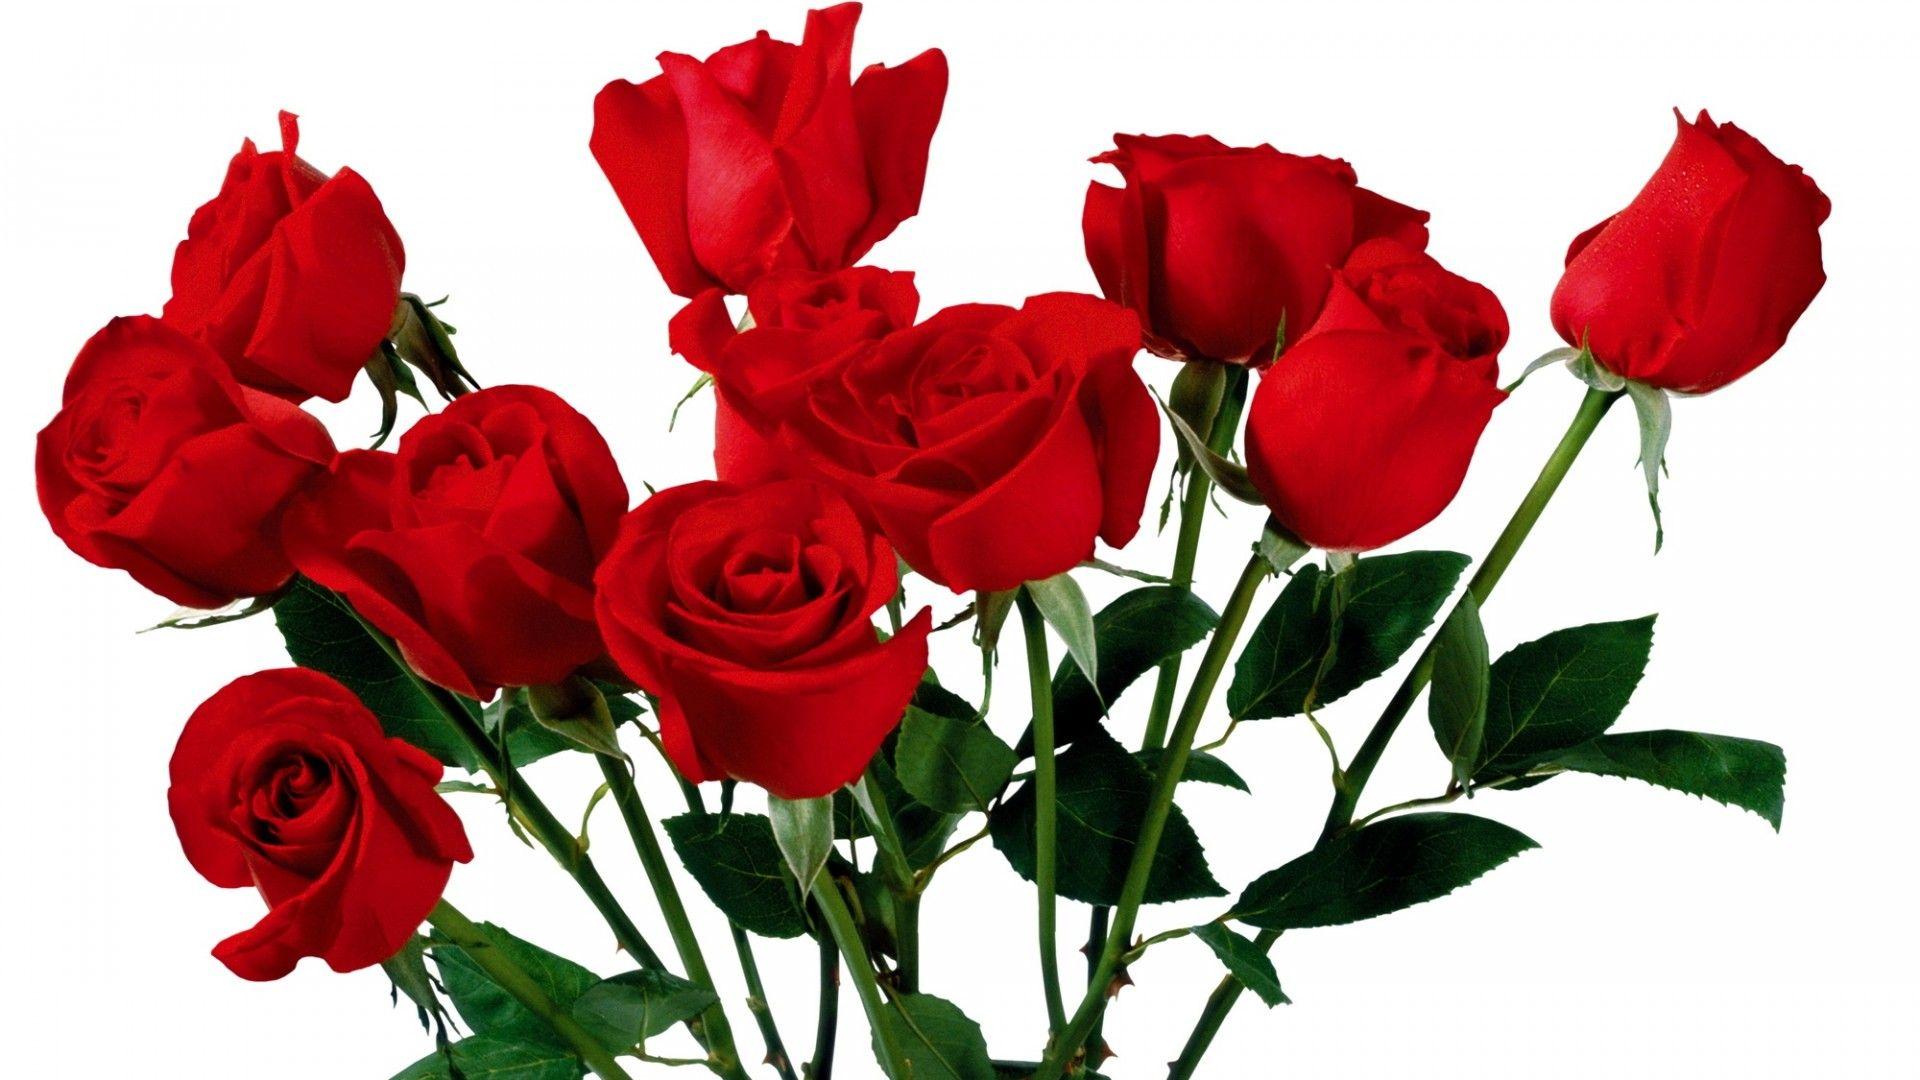 Flowers Flower Red Roses Wallpaper Image Wallwuzz Hd